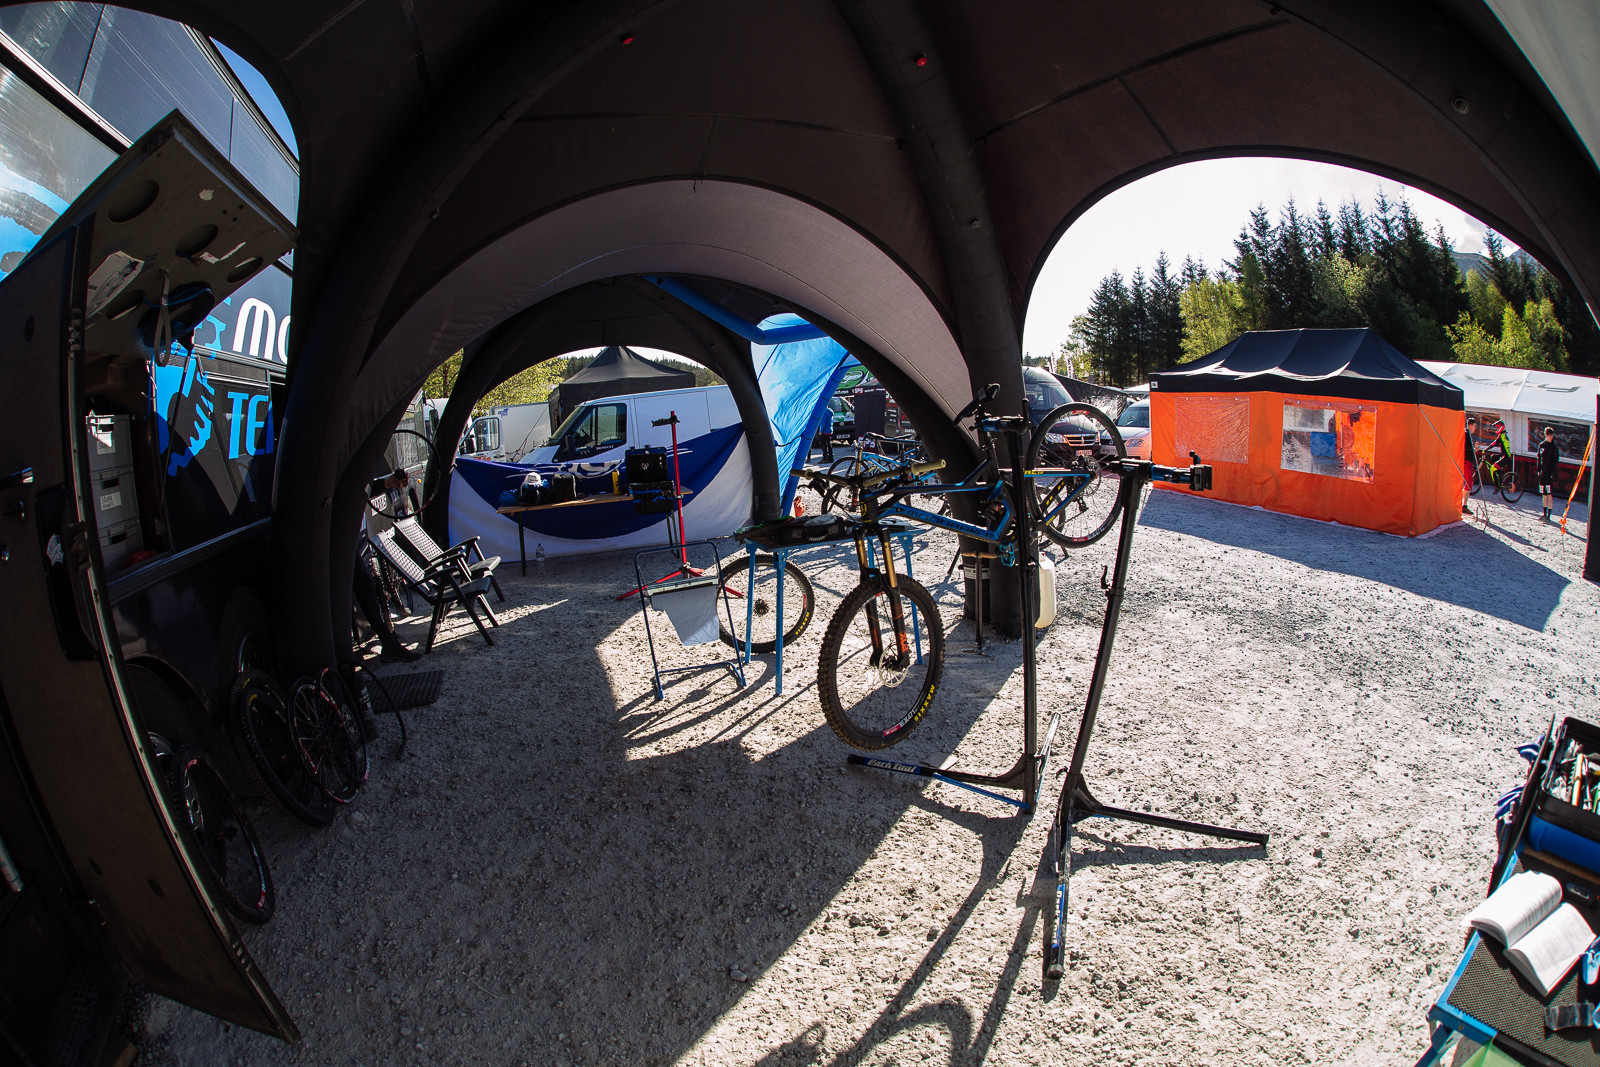 MS Mondraker Pits - PIT BITS - BDS Fort William - Mountain Biking Pictures - Vital MTB